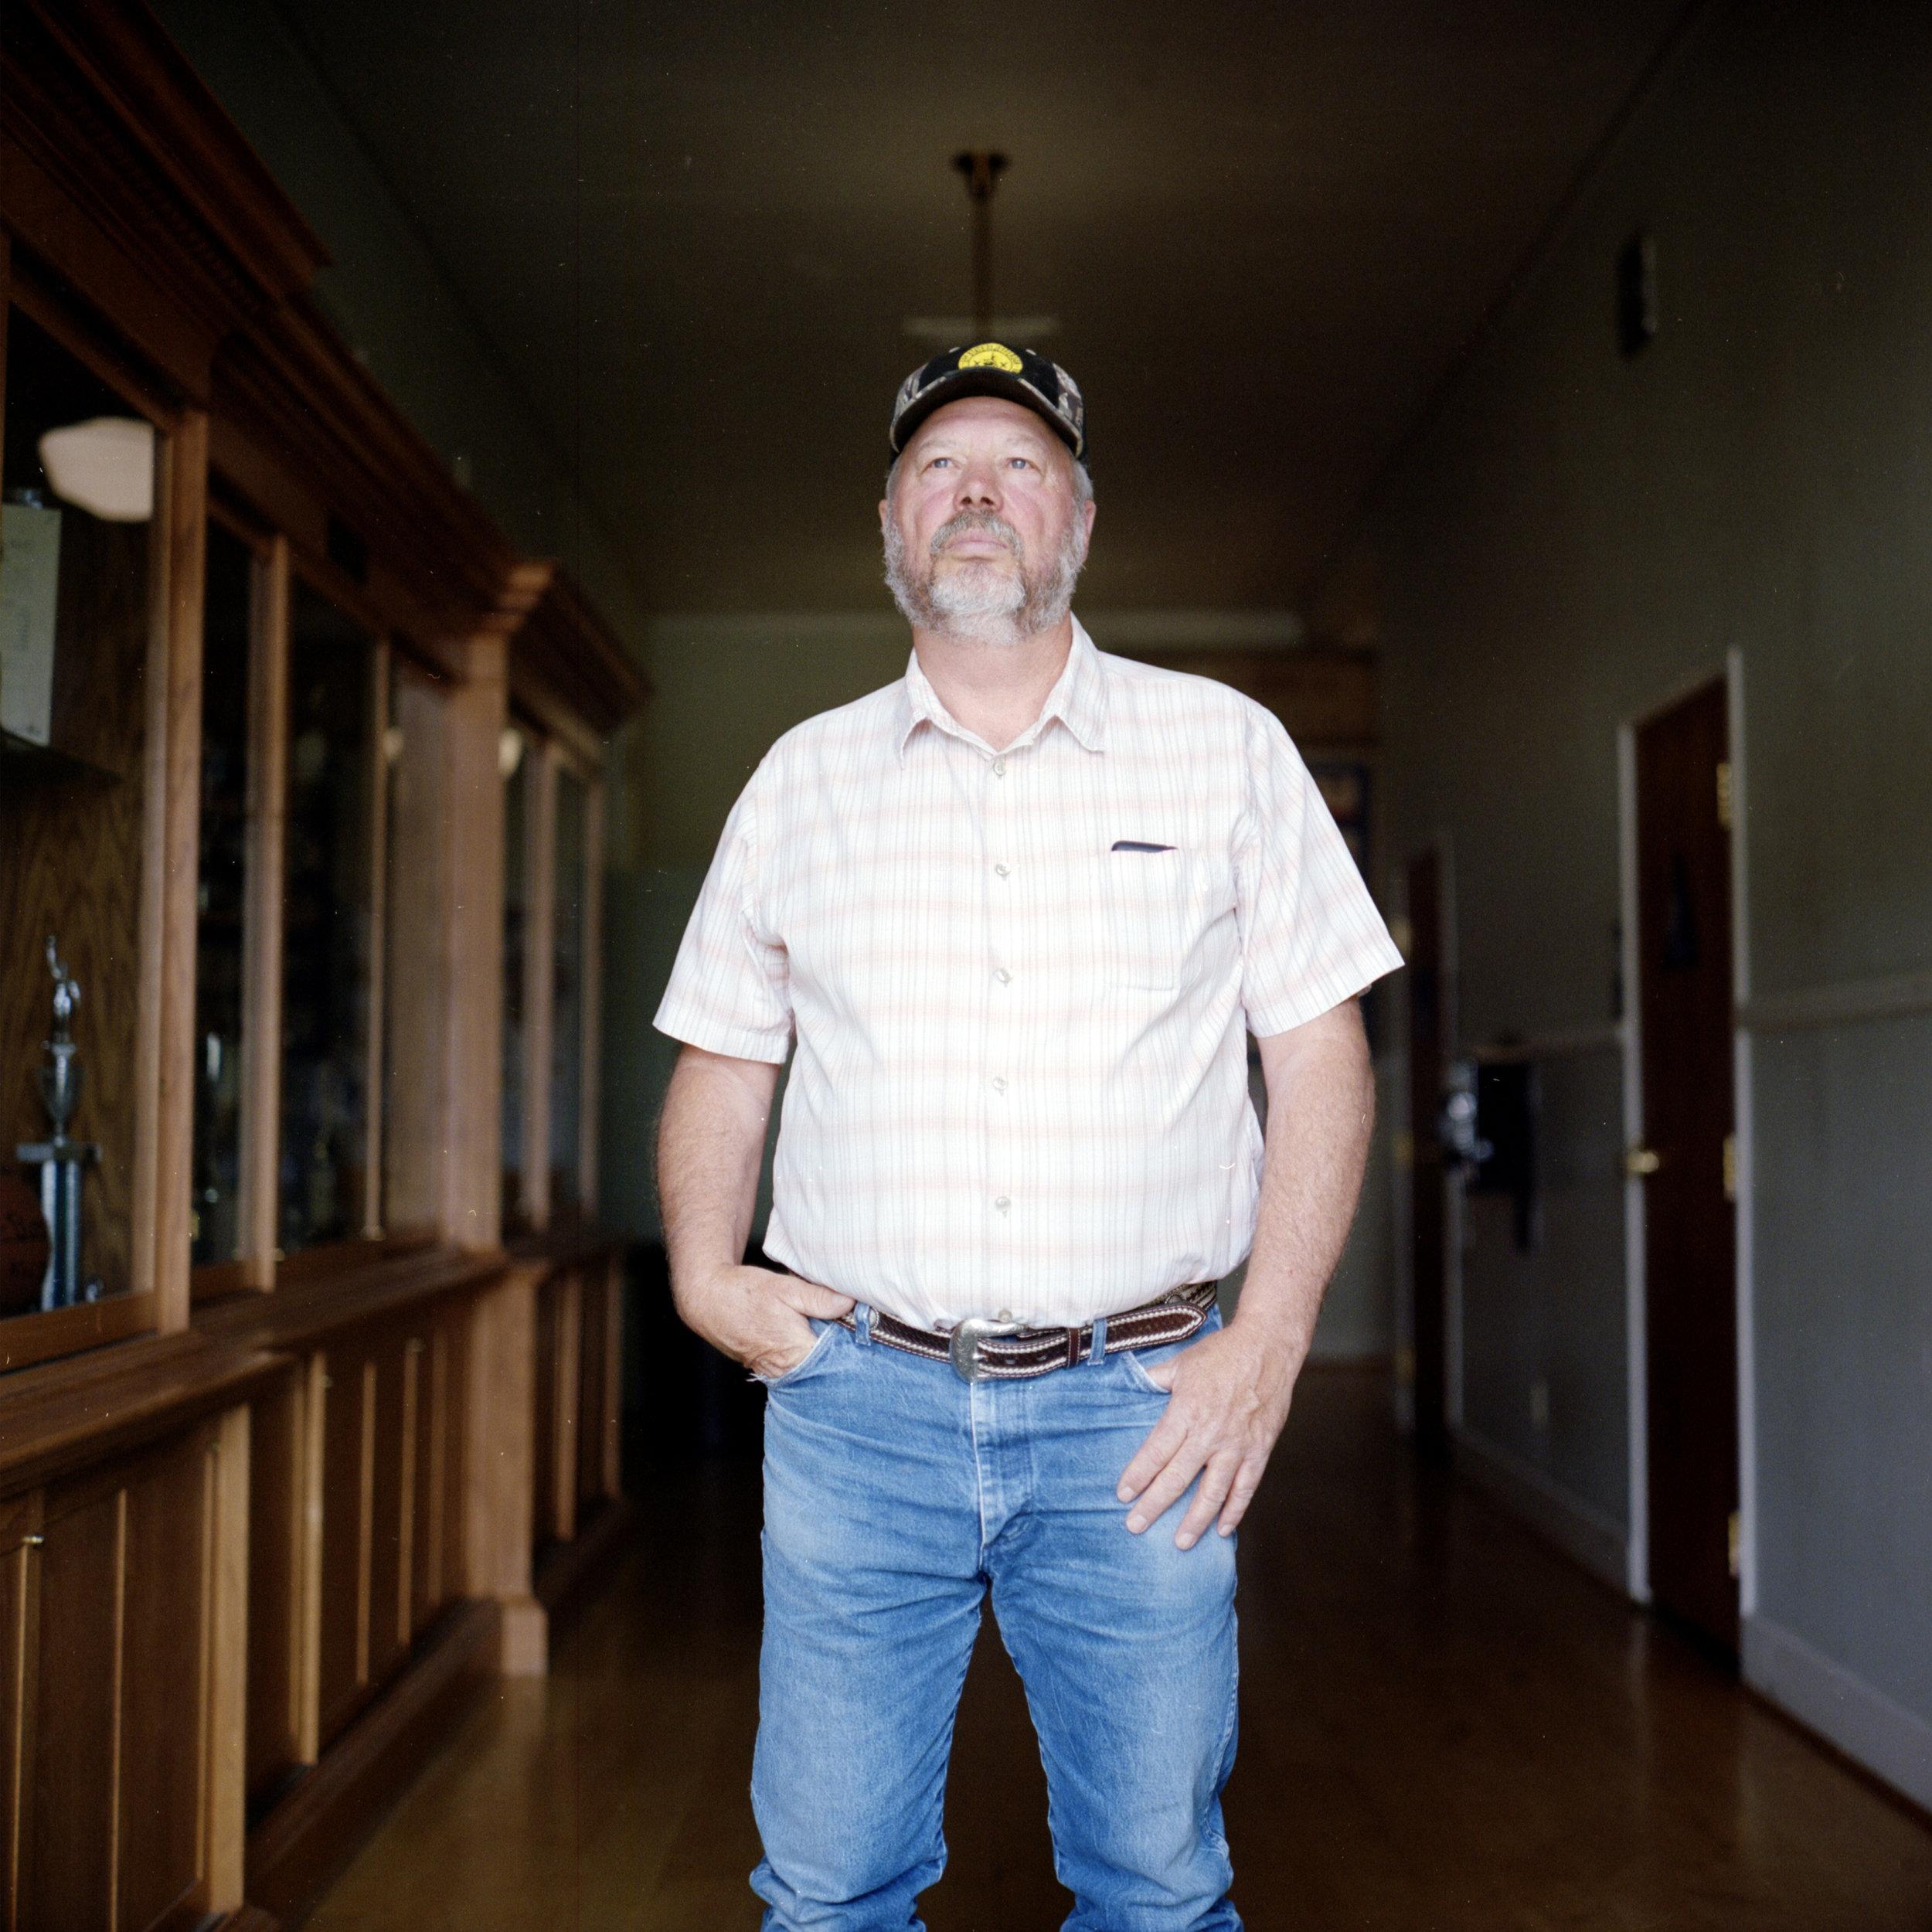 Tom McCulley, Mayor, City of Fort Jones